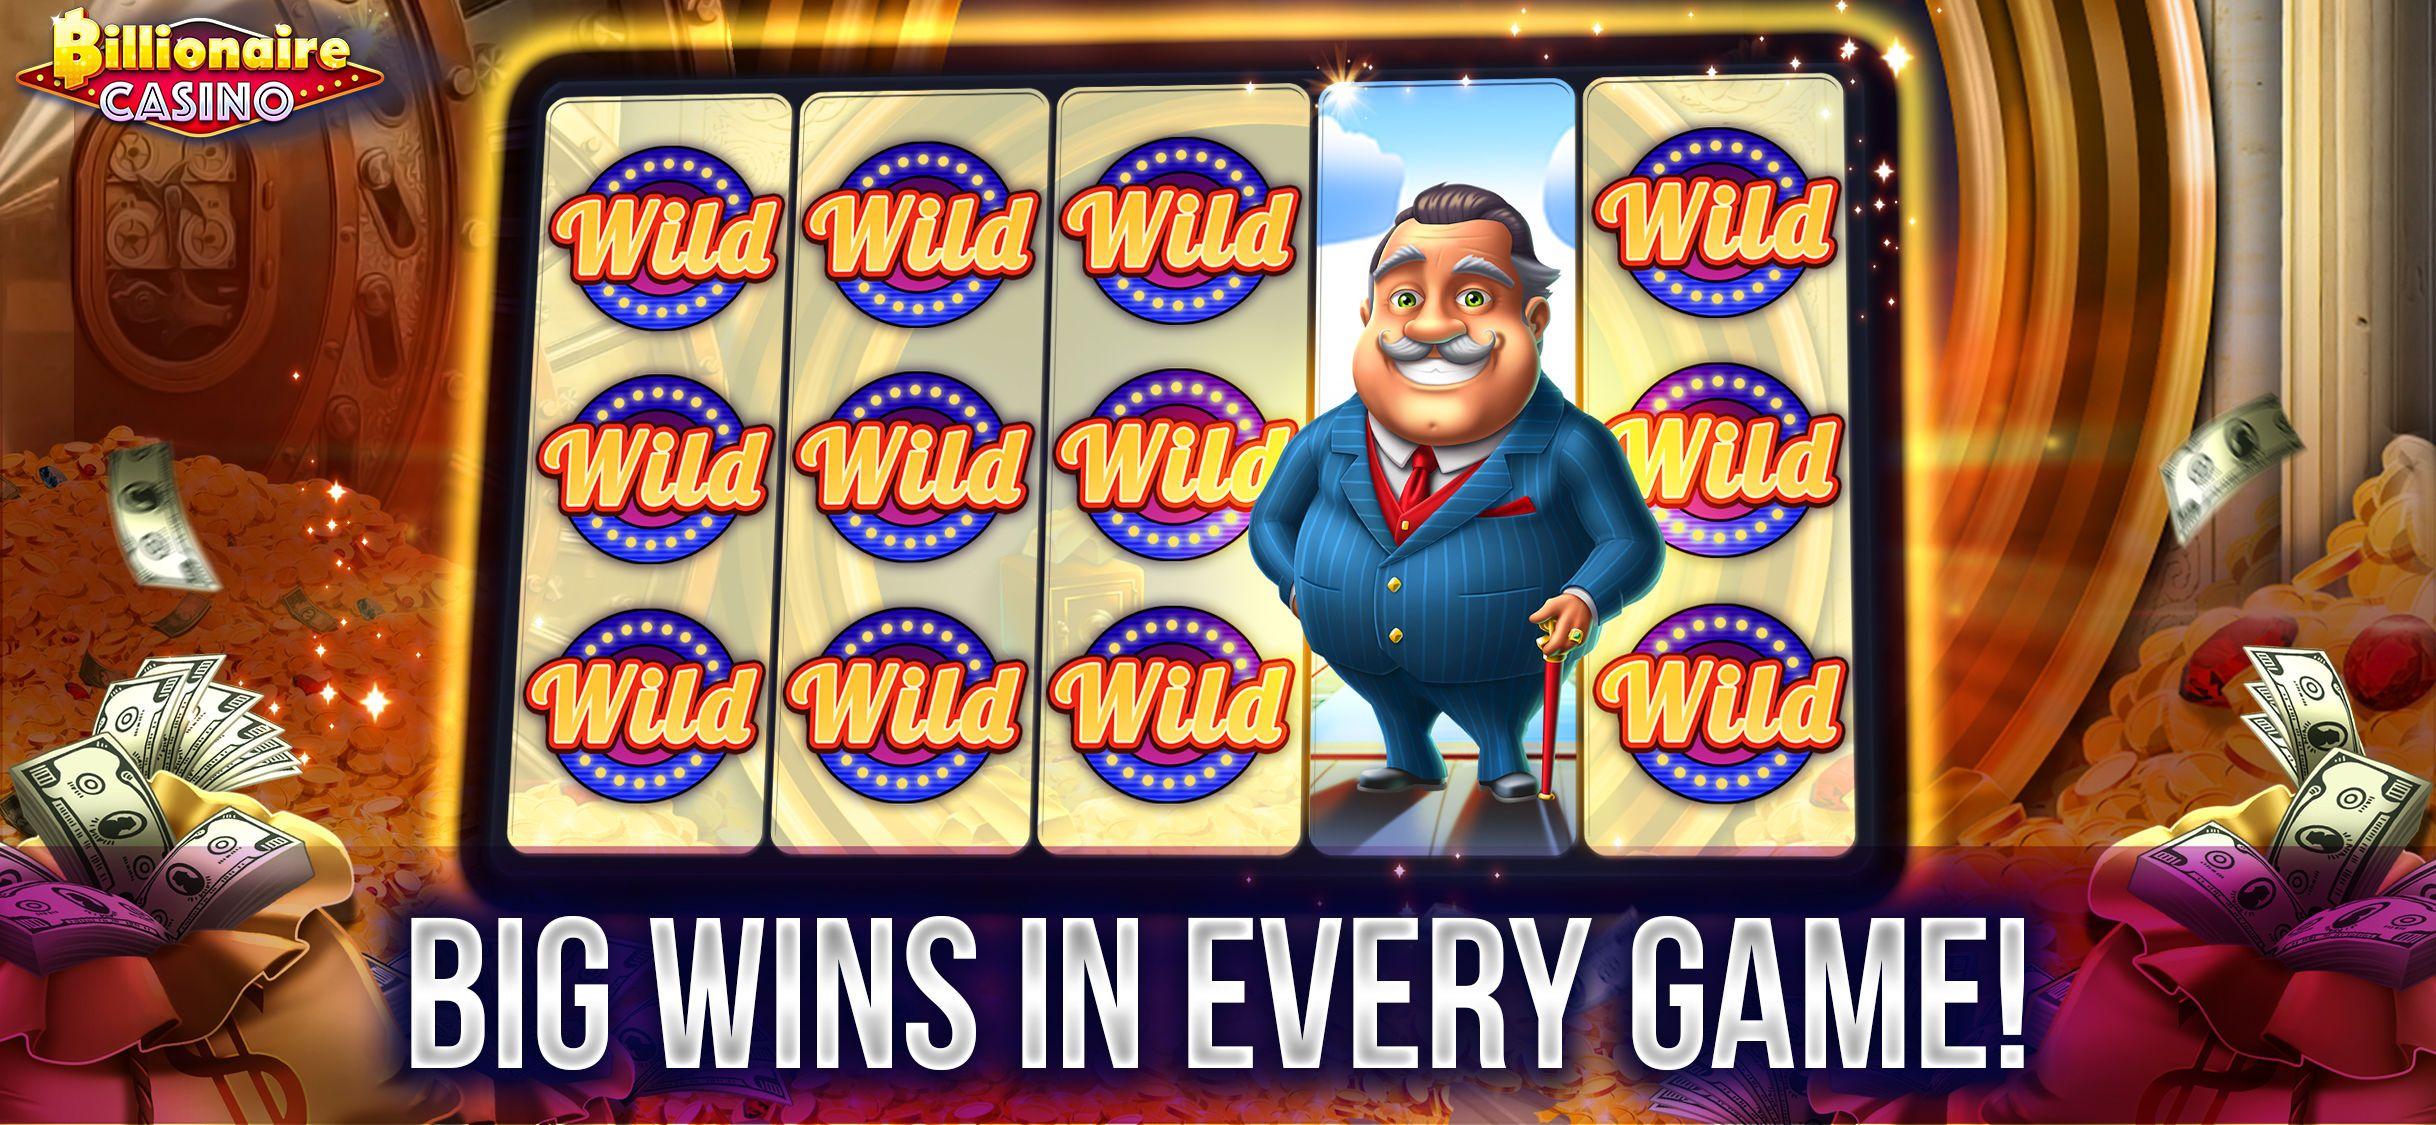 Slots Billionaire Casino Hack